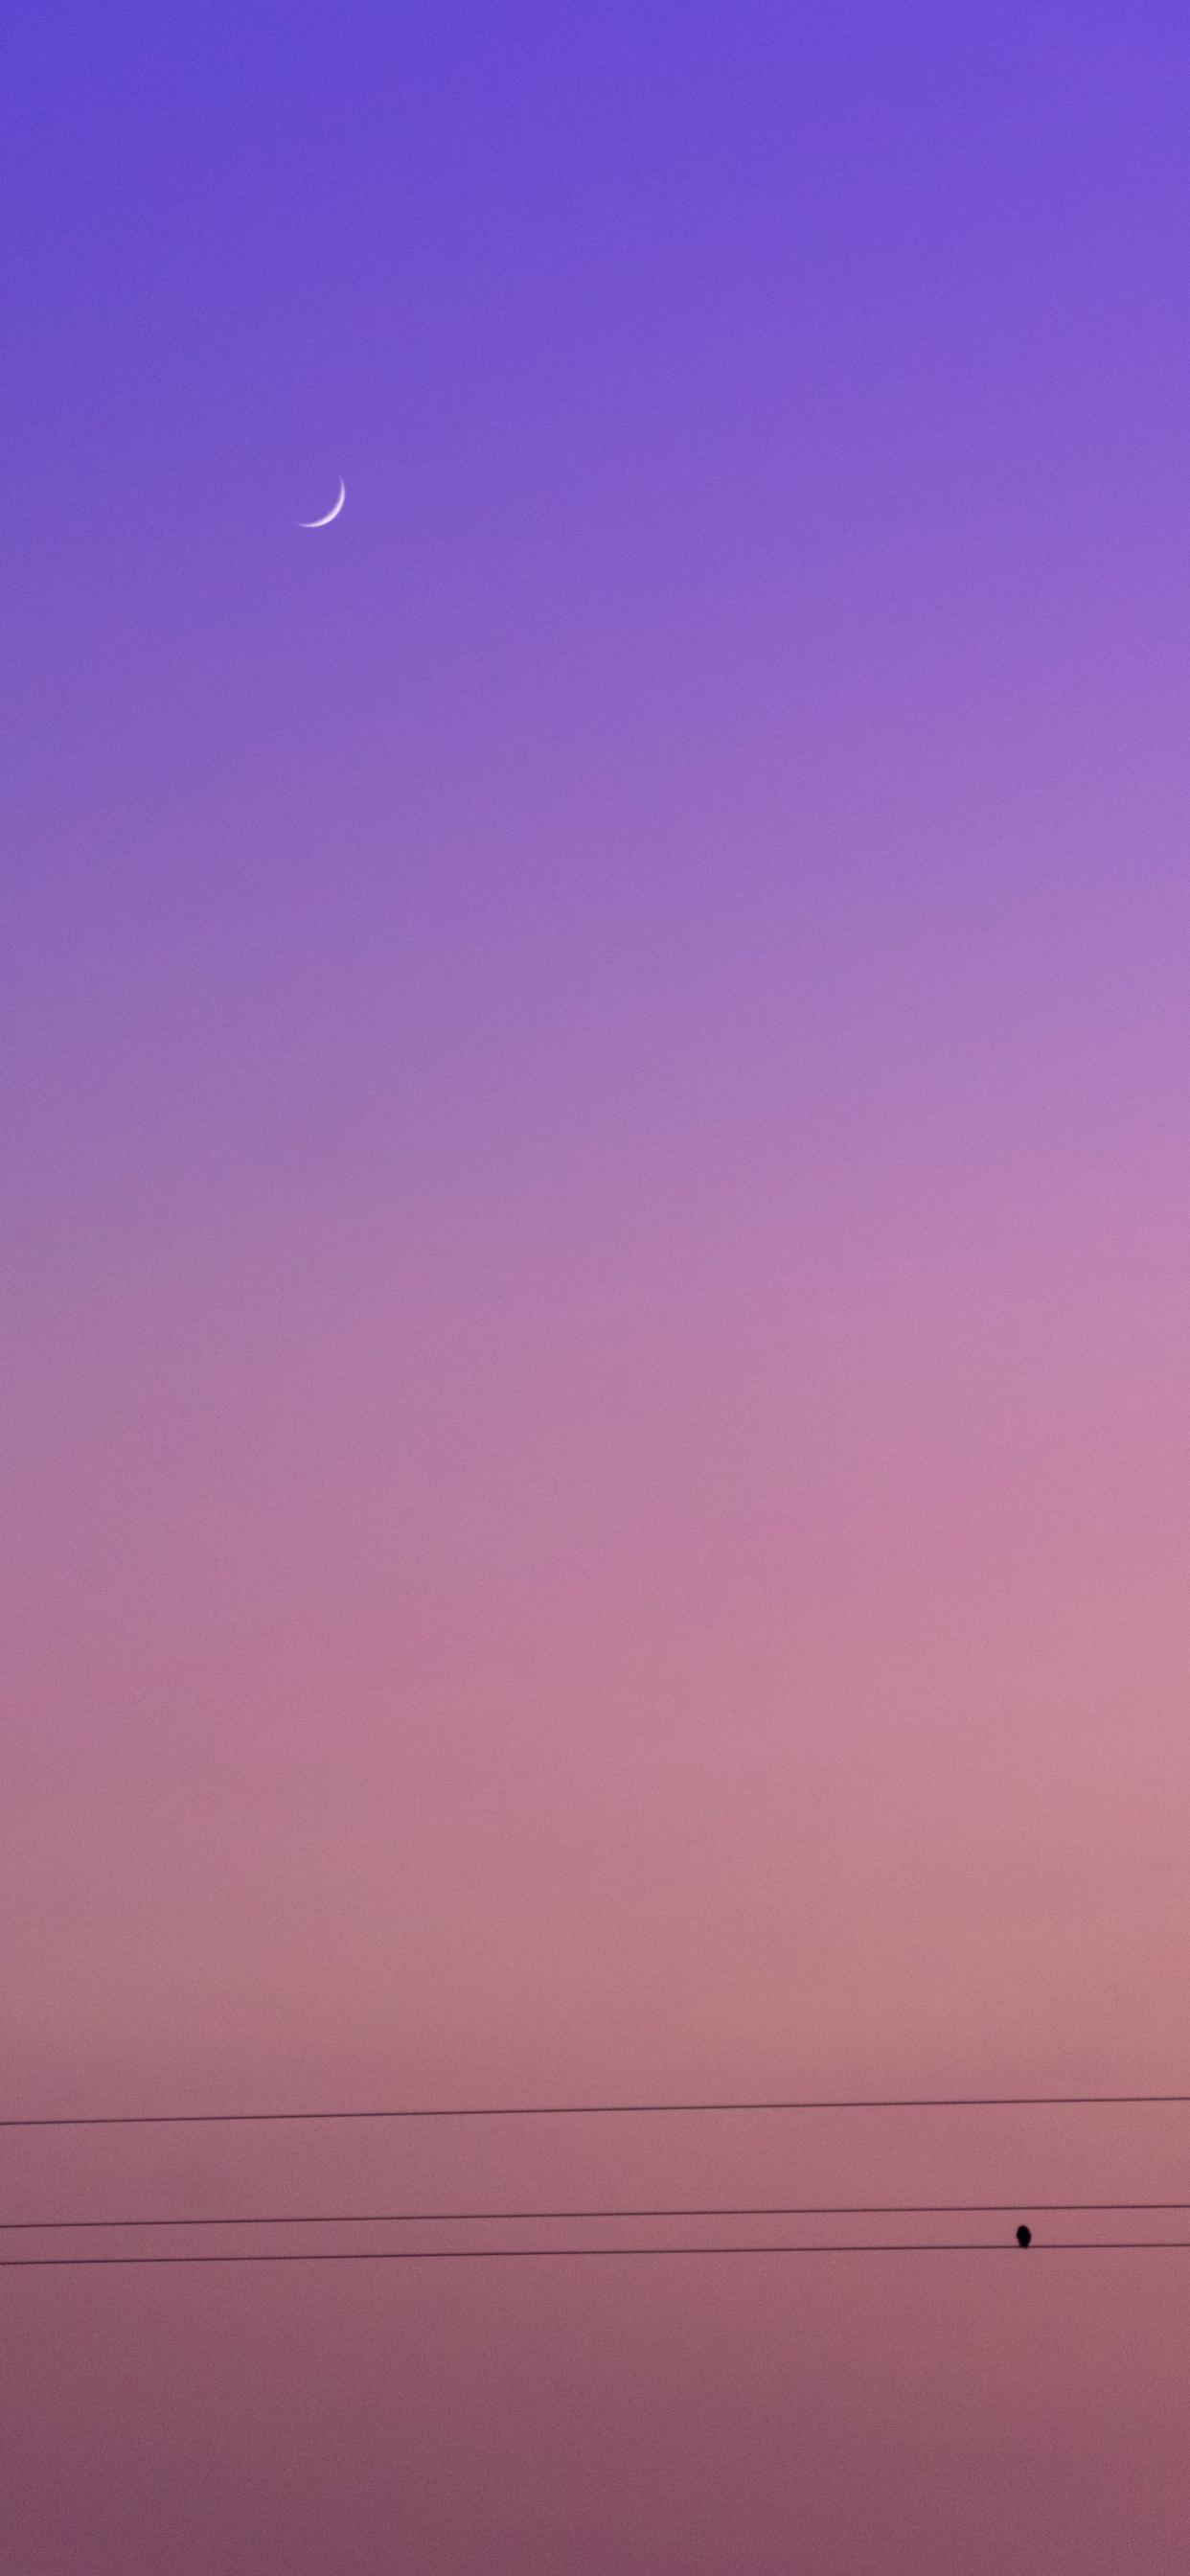 iPhone wallpapers moon purple sky Fonds d'écran iPhone du 05/06/2020